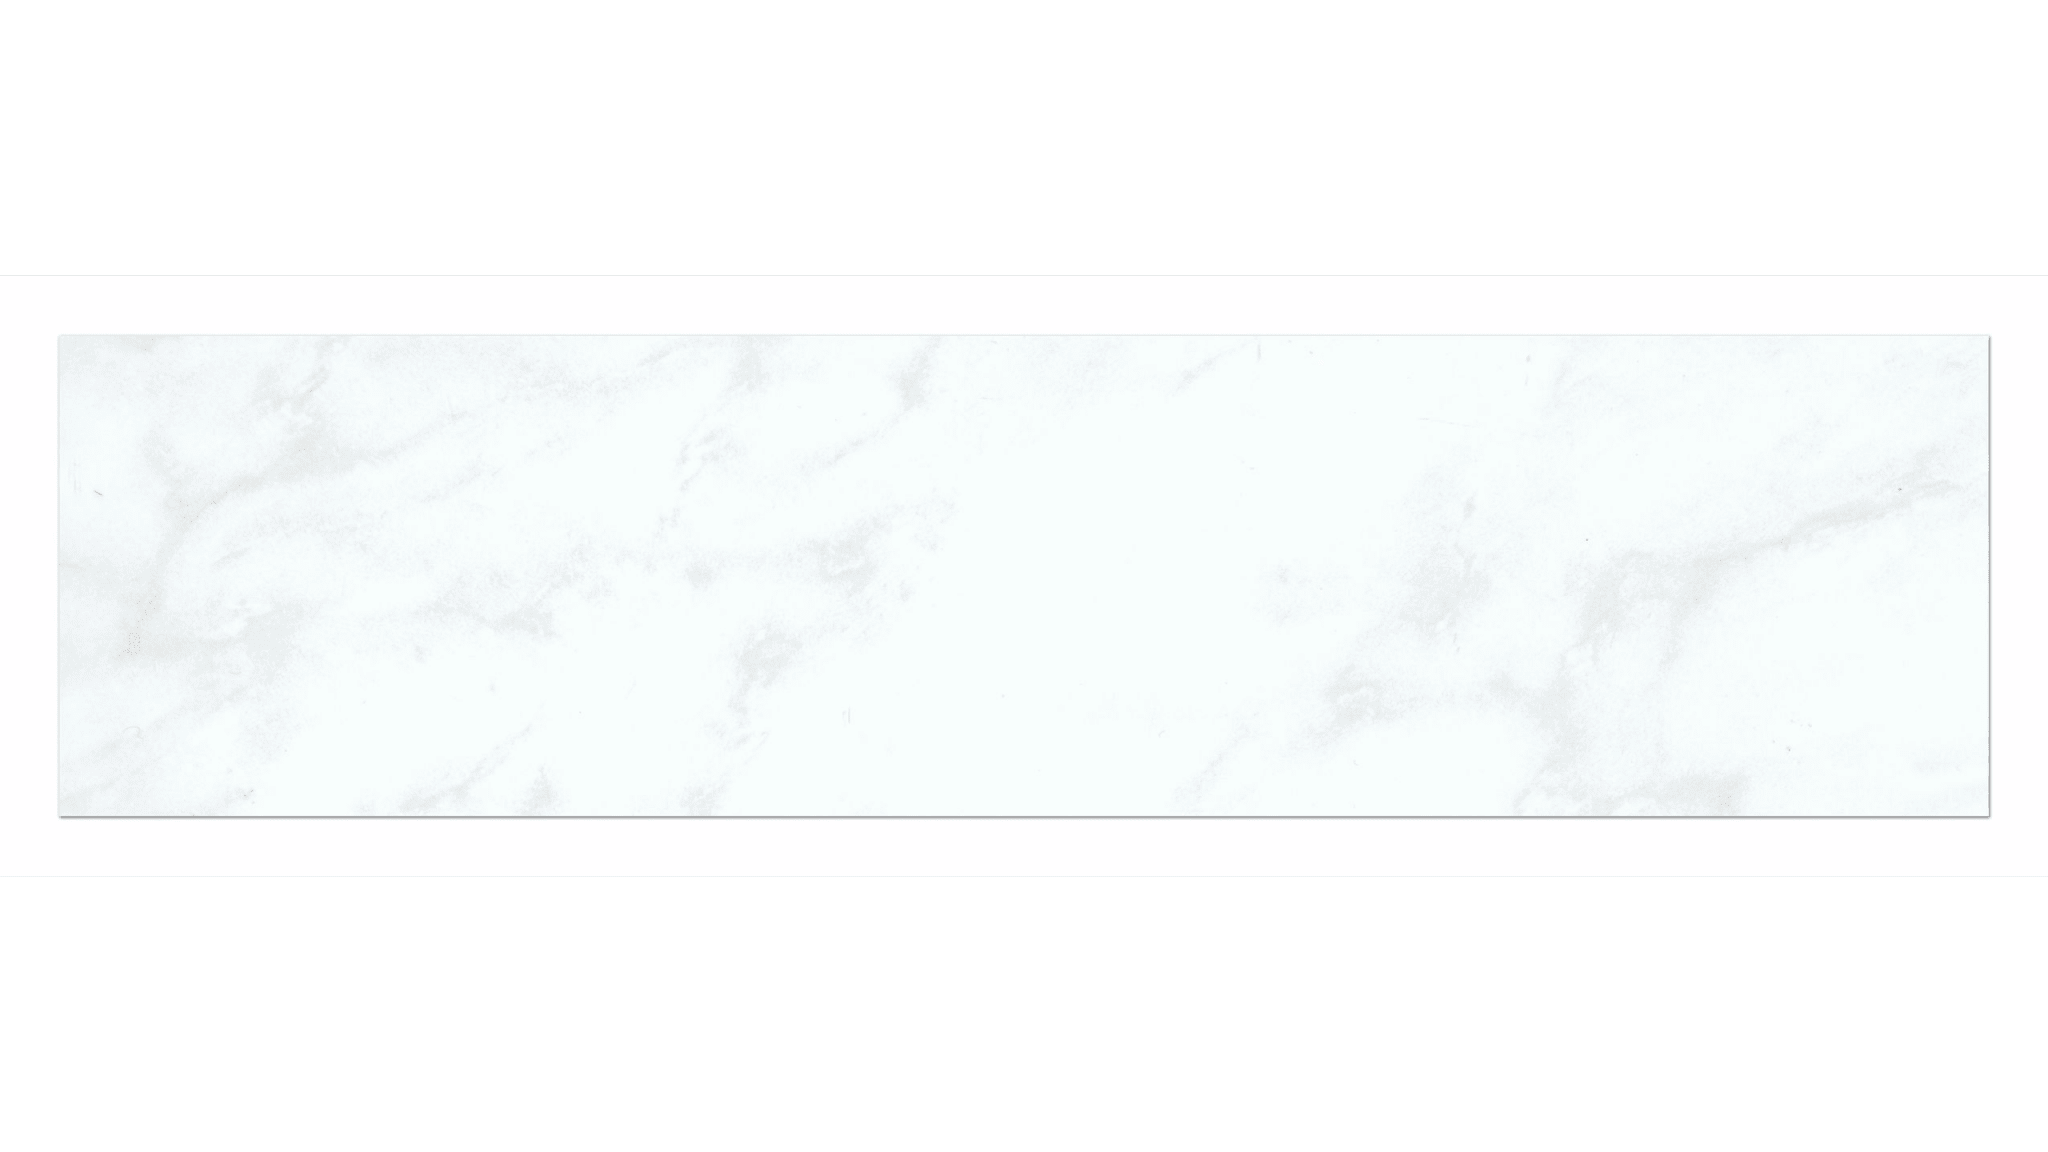 Carrara Gris Ceramic Subway Tile X In Luxury Bathroom Products - Carrara gris porcelain tile